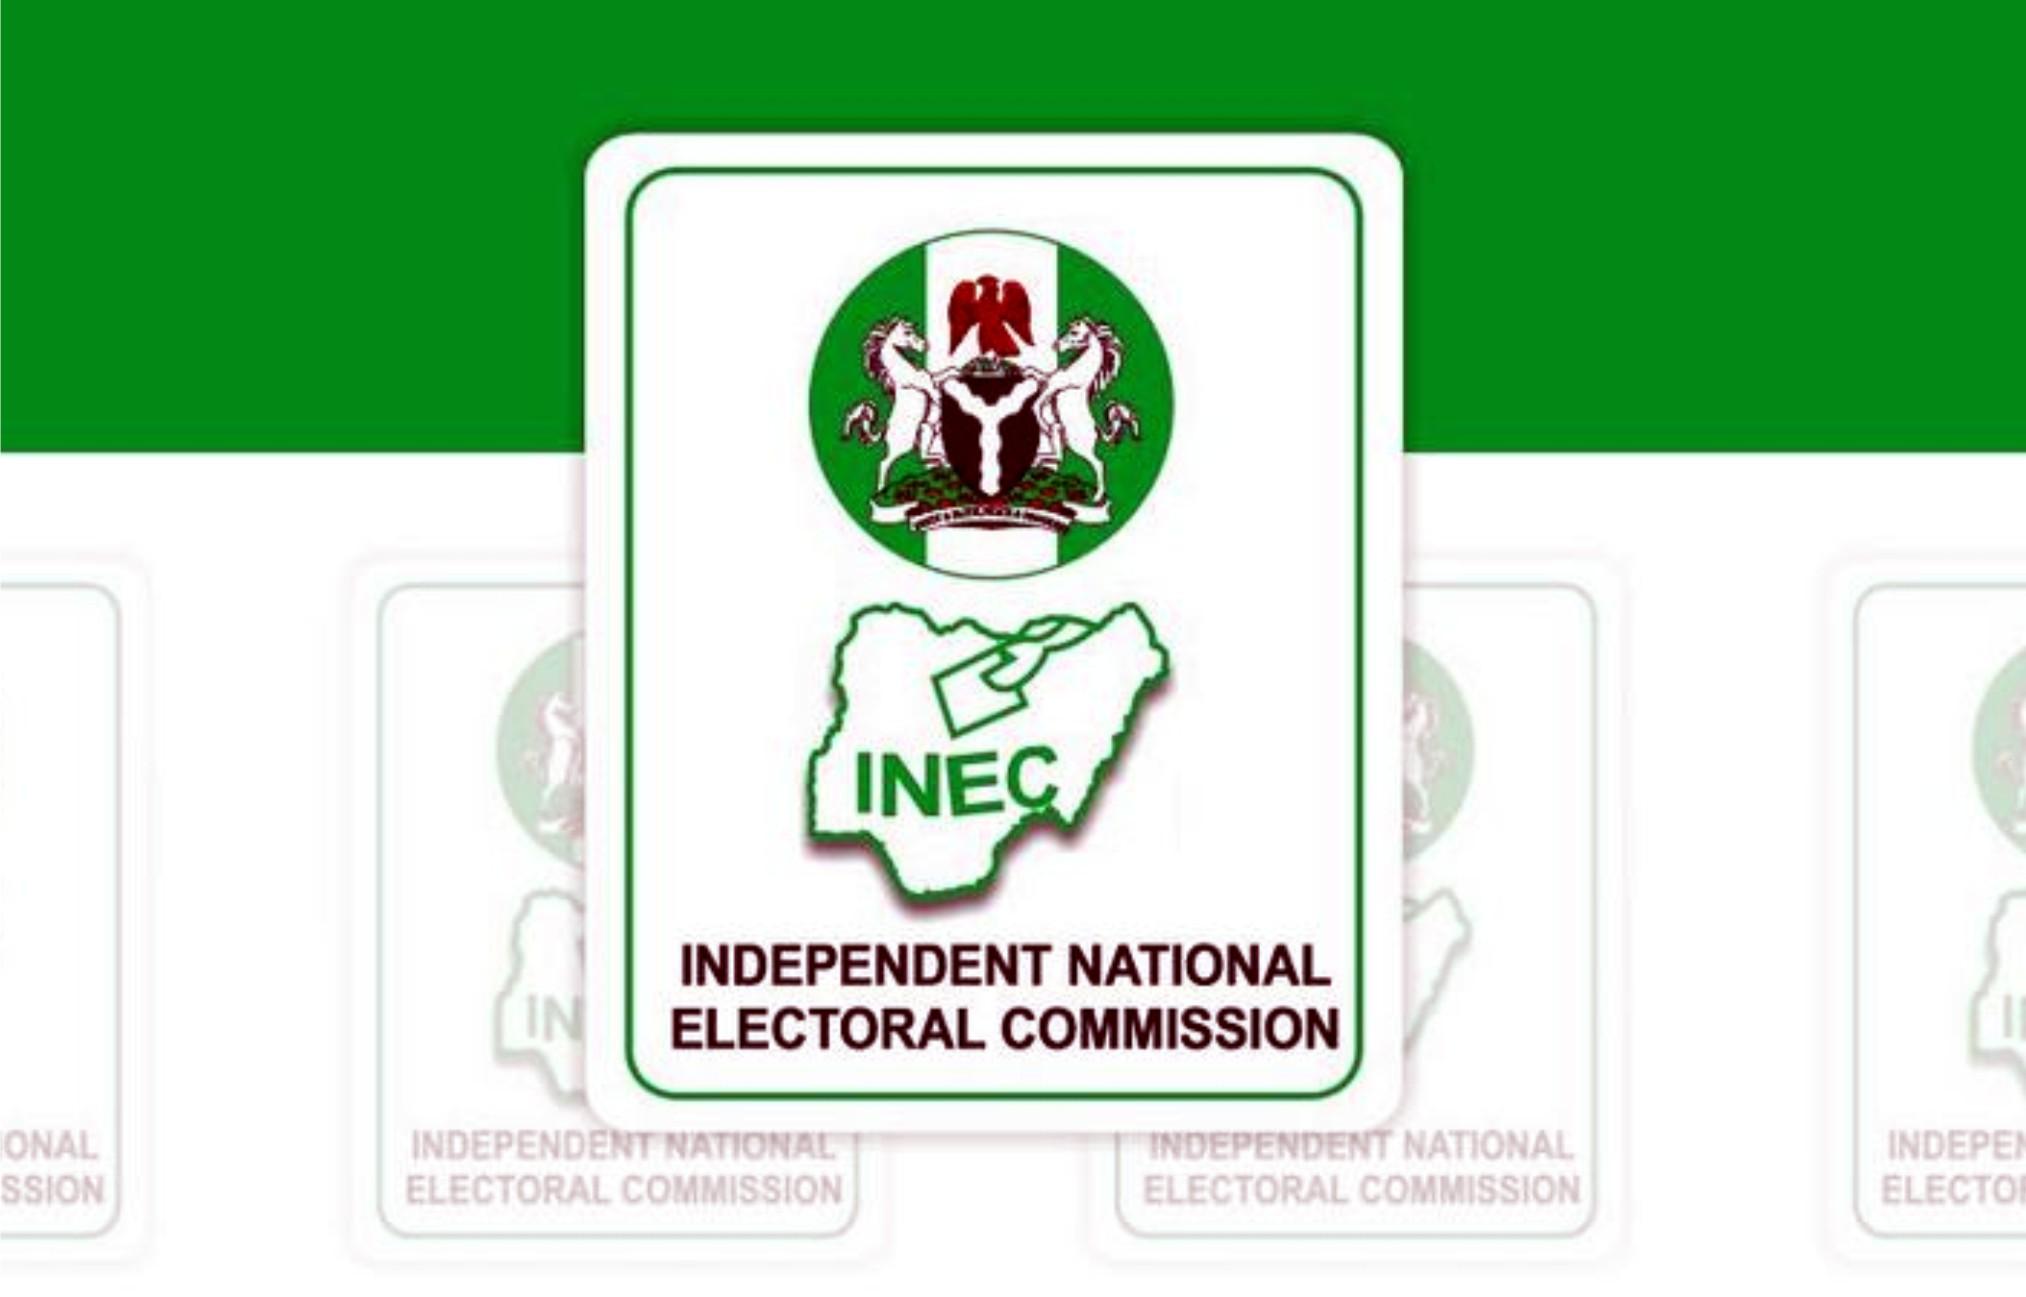 INEC Recruitment for Graduates Portal 2021/2022 www.inecnigeria.org